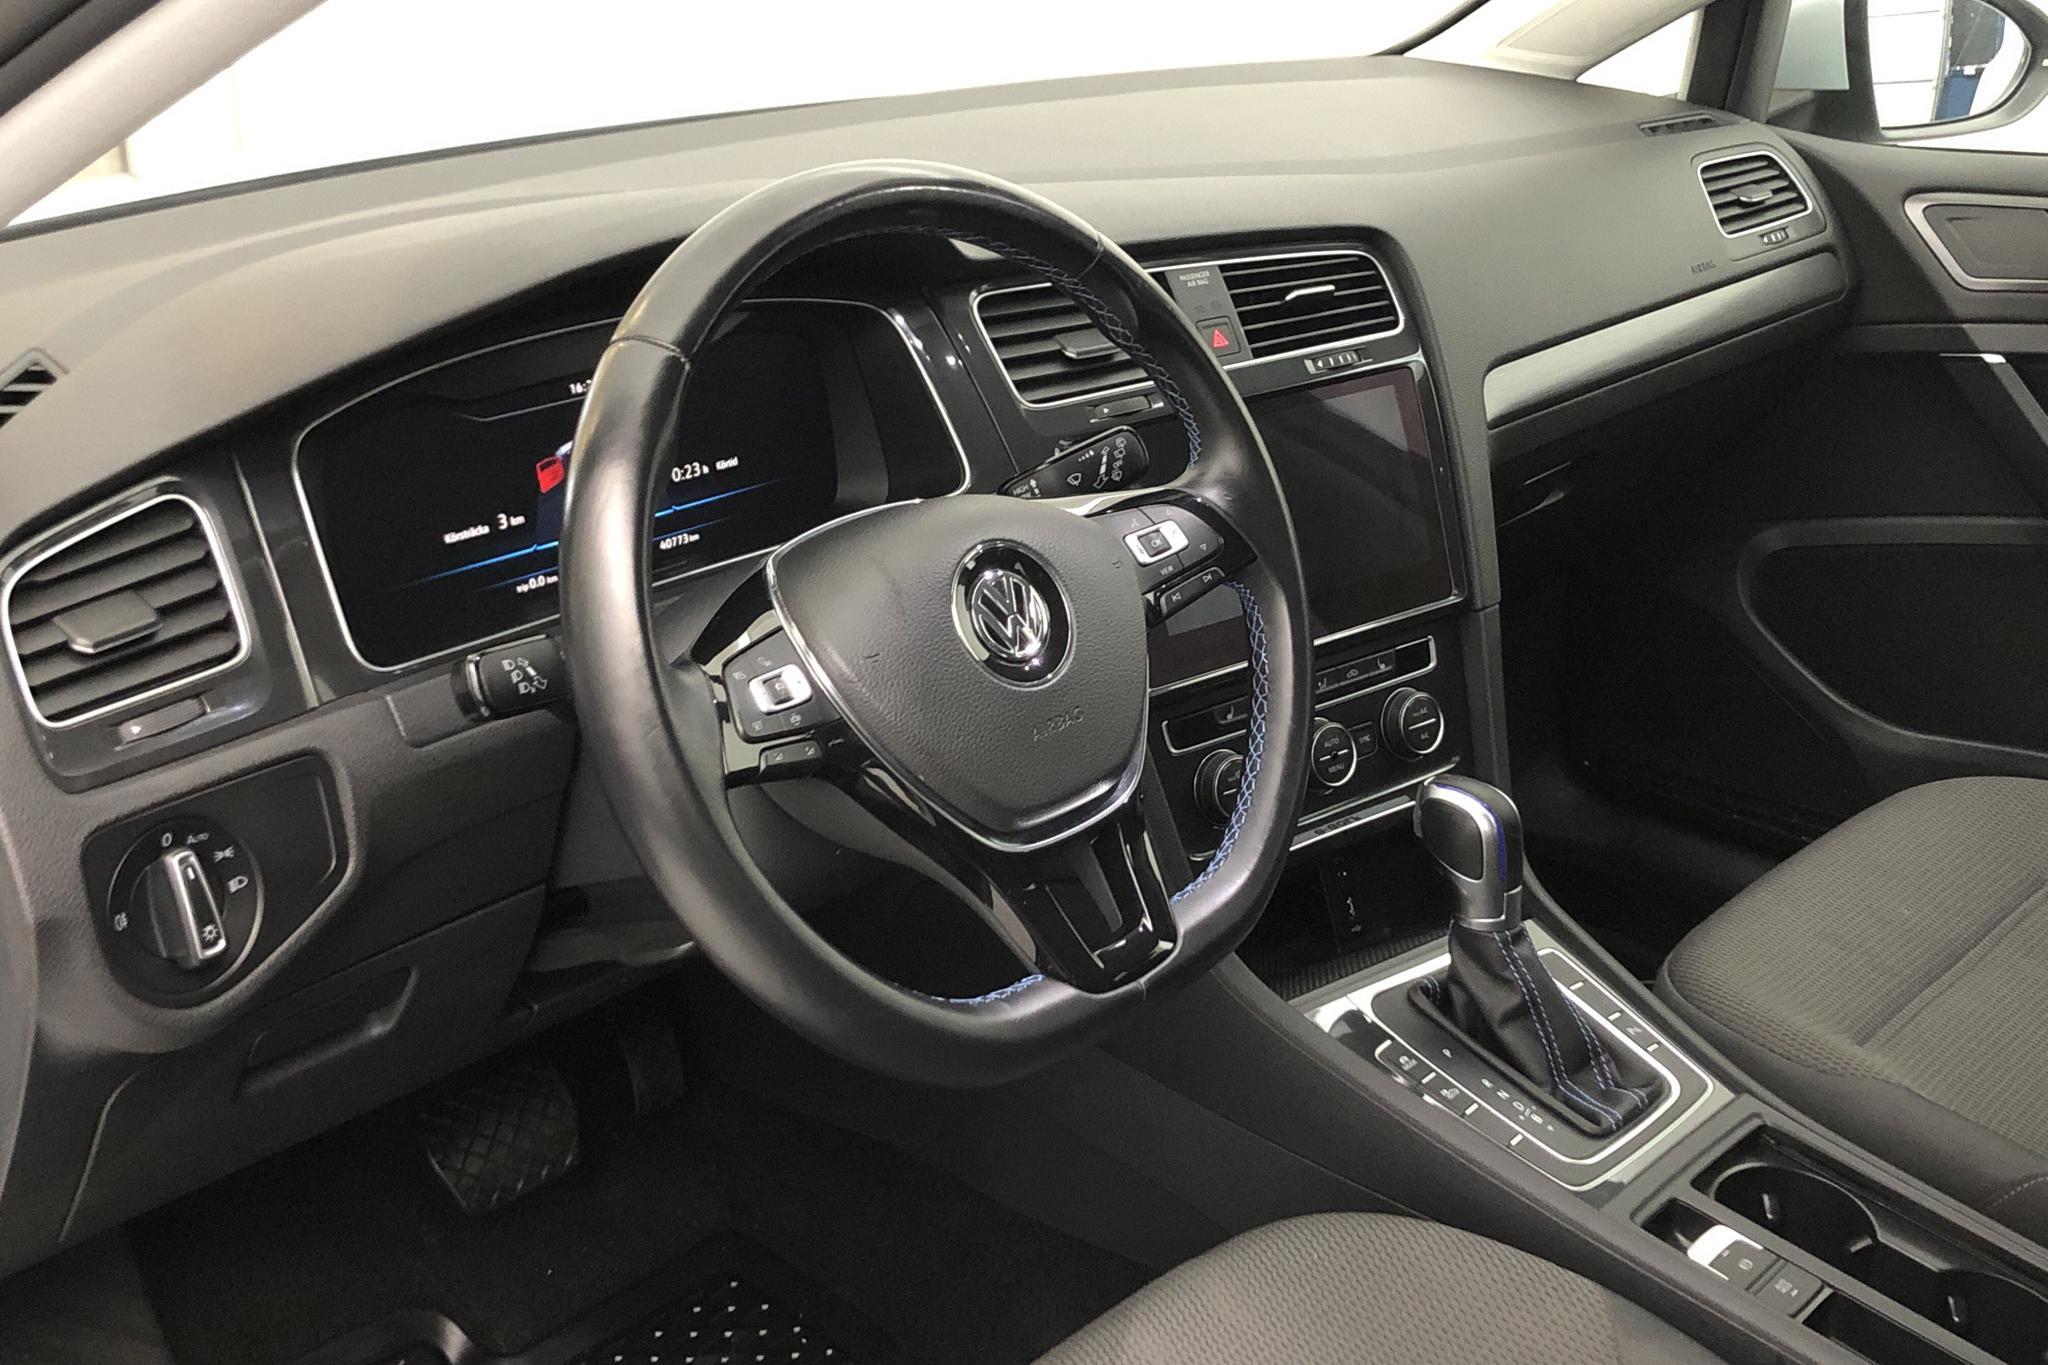 VW e-Golf VII 5dr (136hk) - 4 077 mil - Automat - Light Grey - 2019